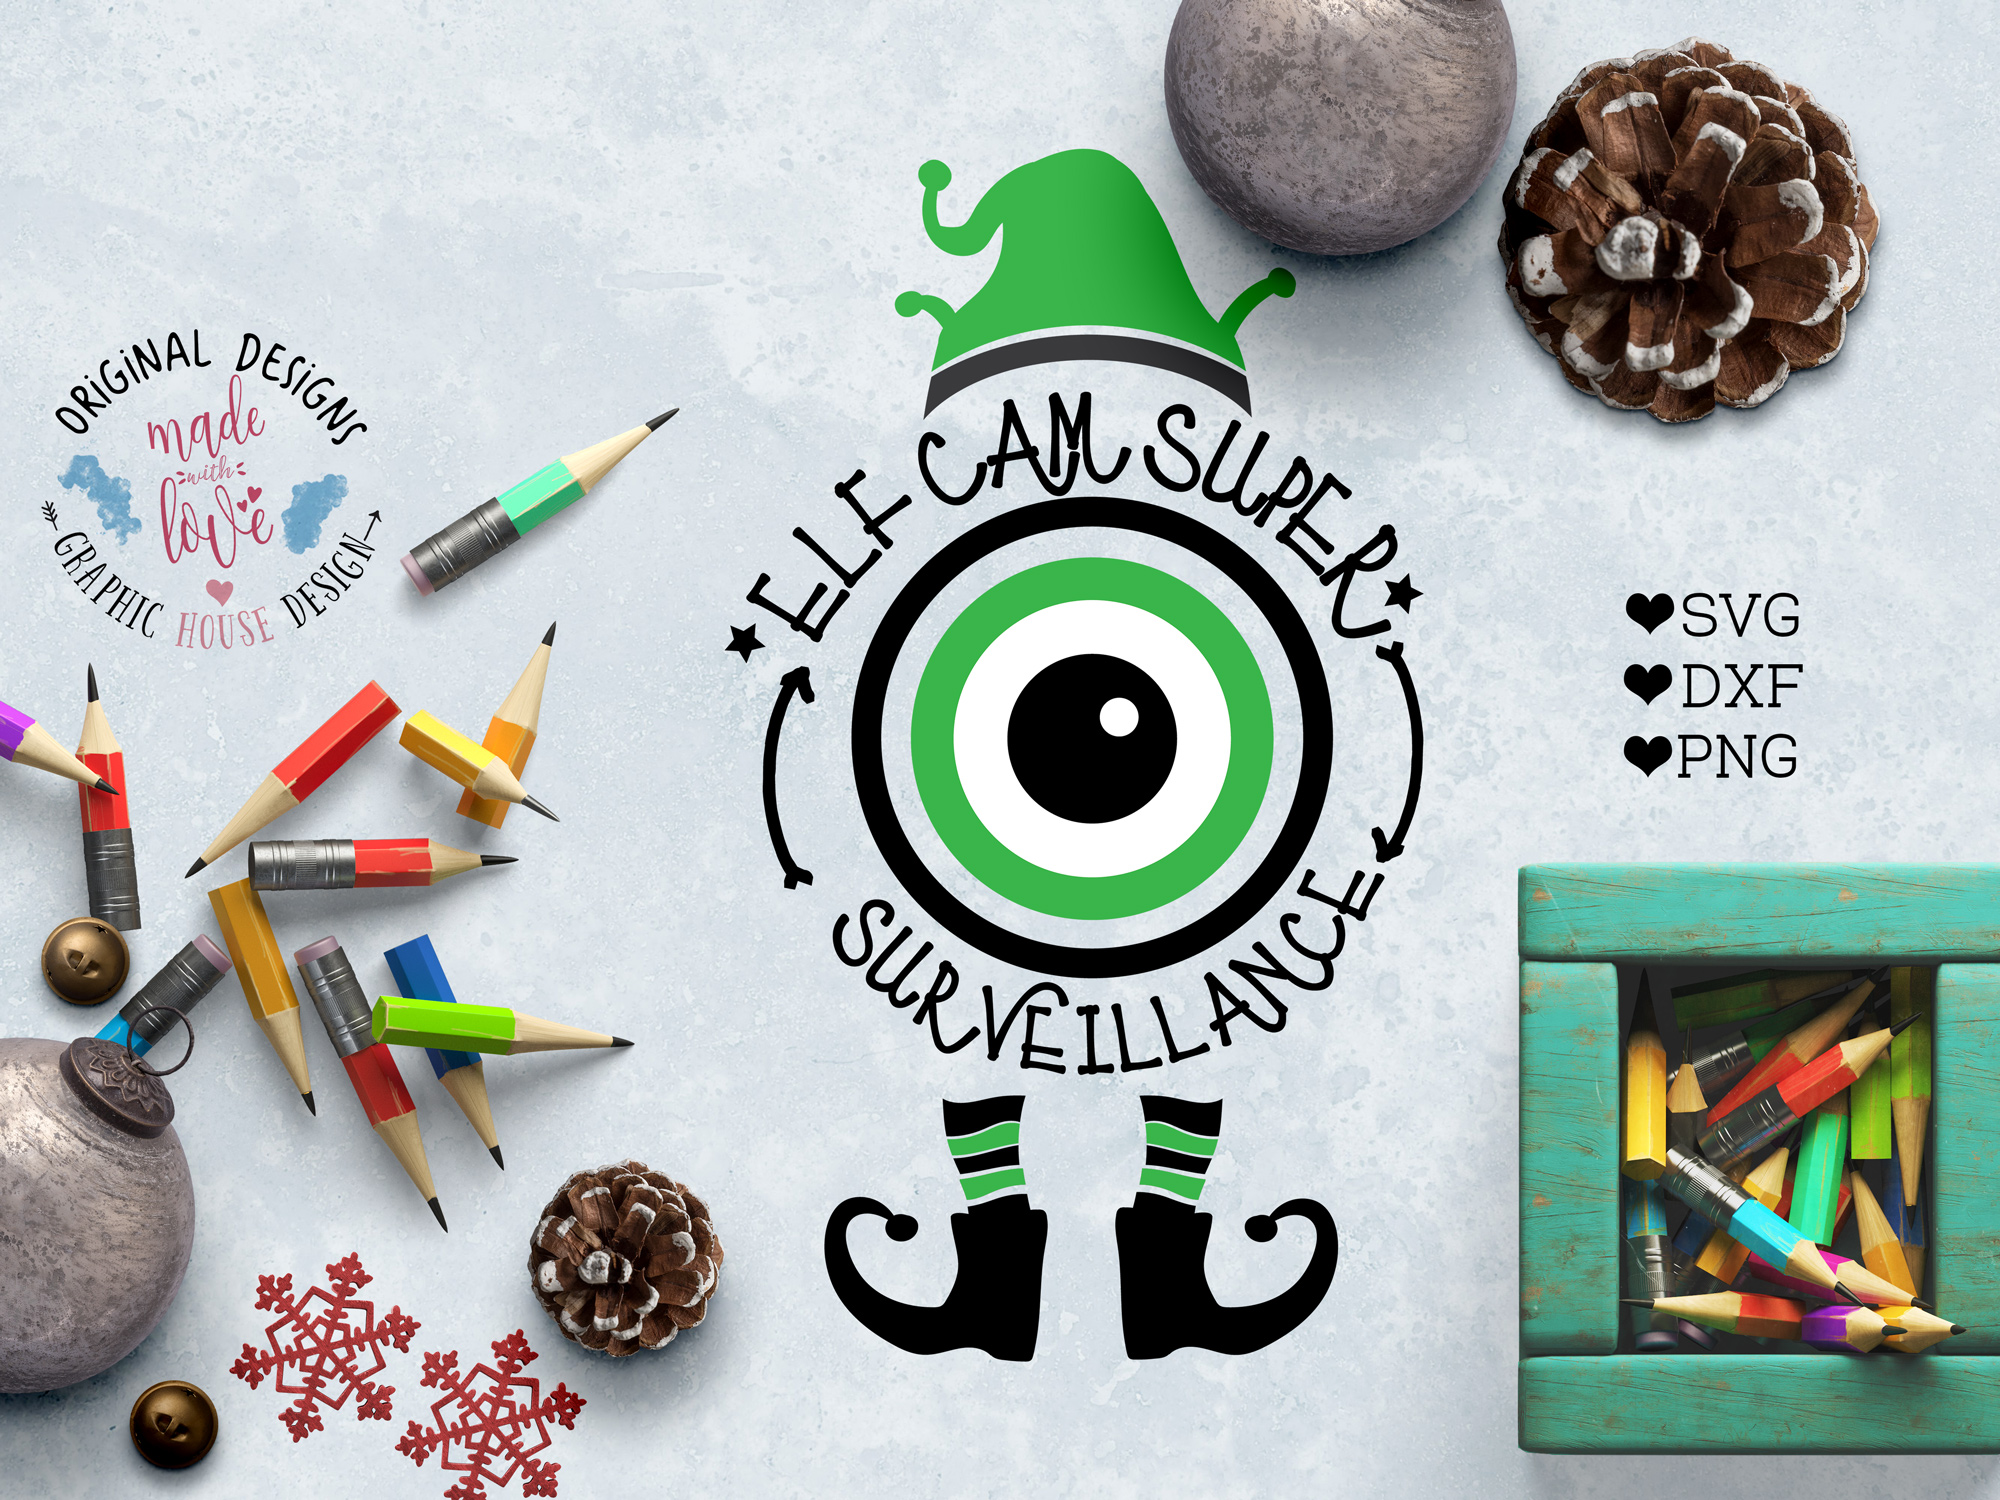 Elf's Cam Surveillance - Christmas Cut File example image 1